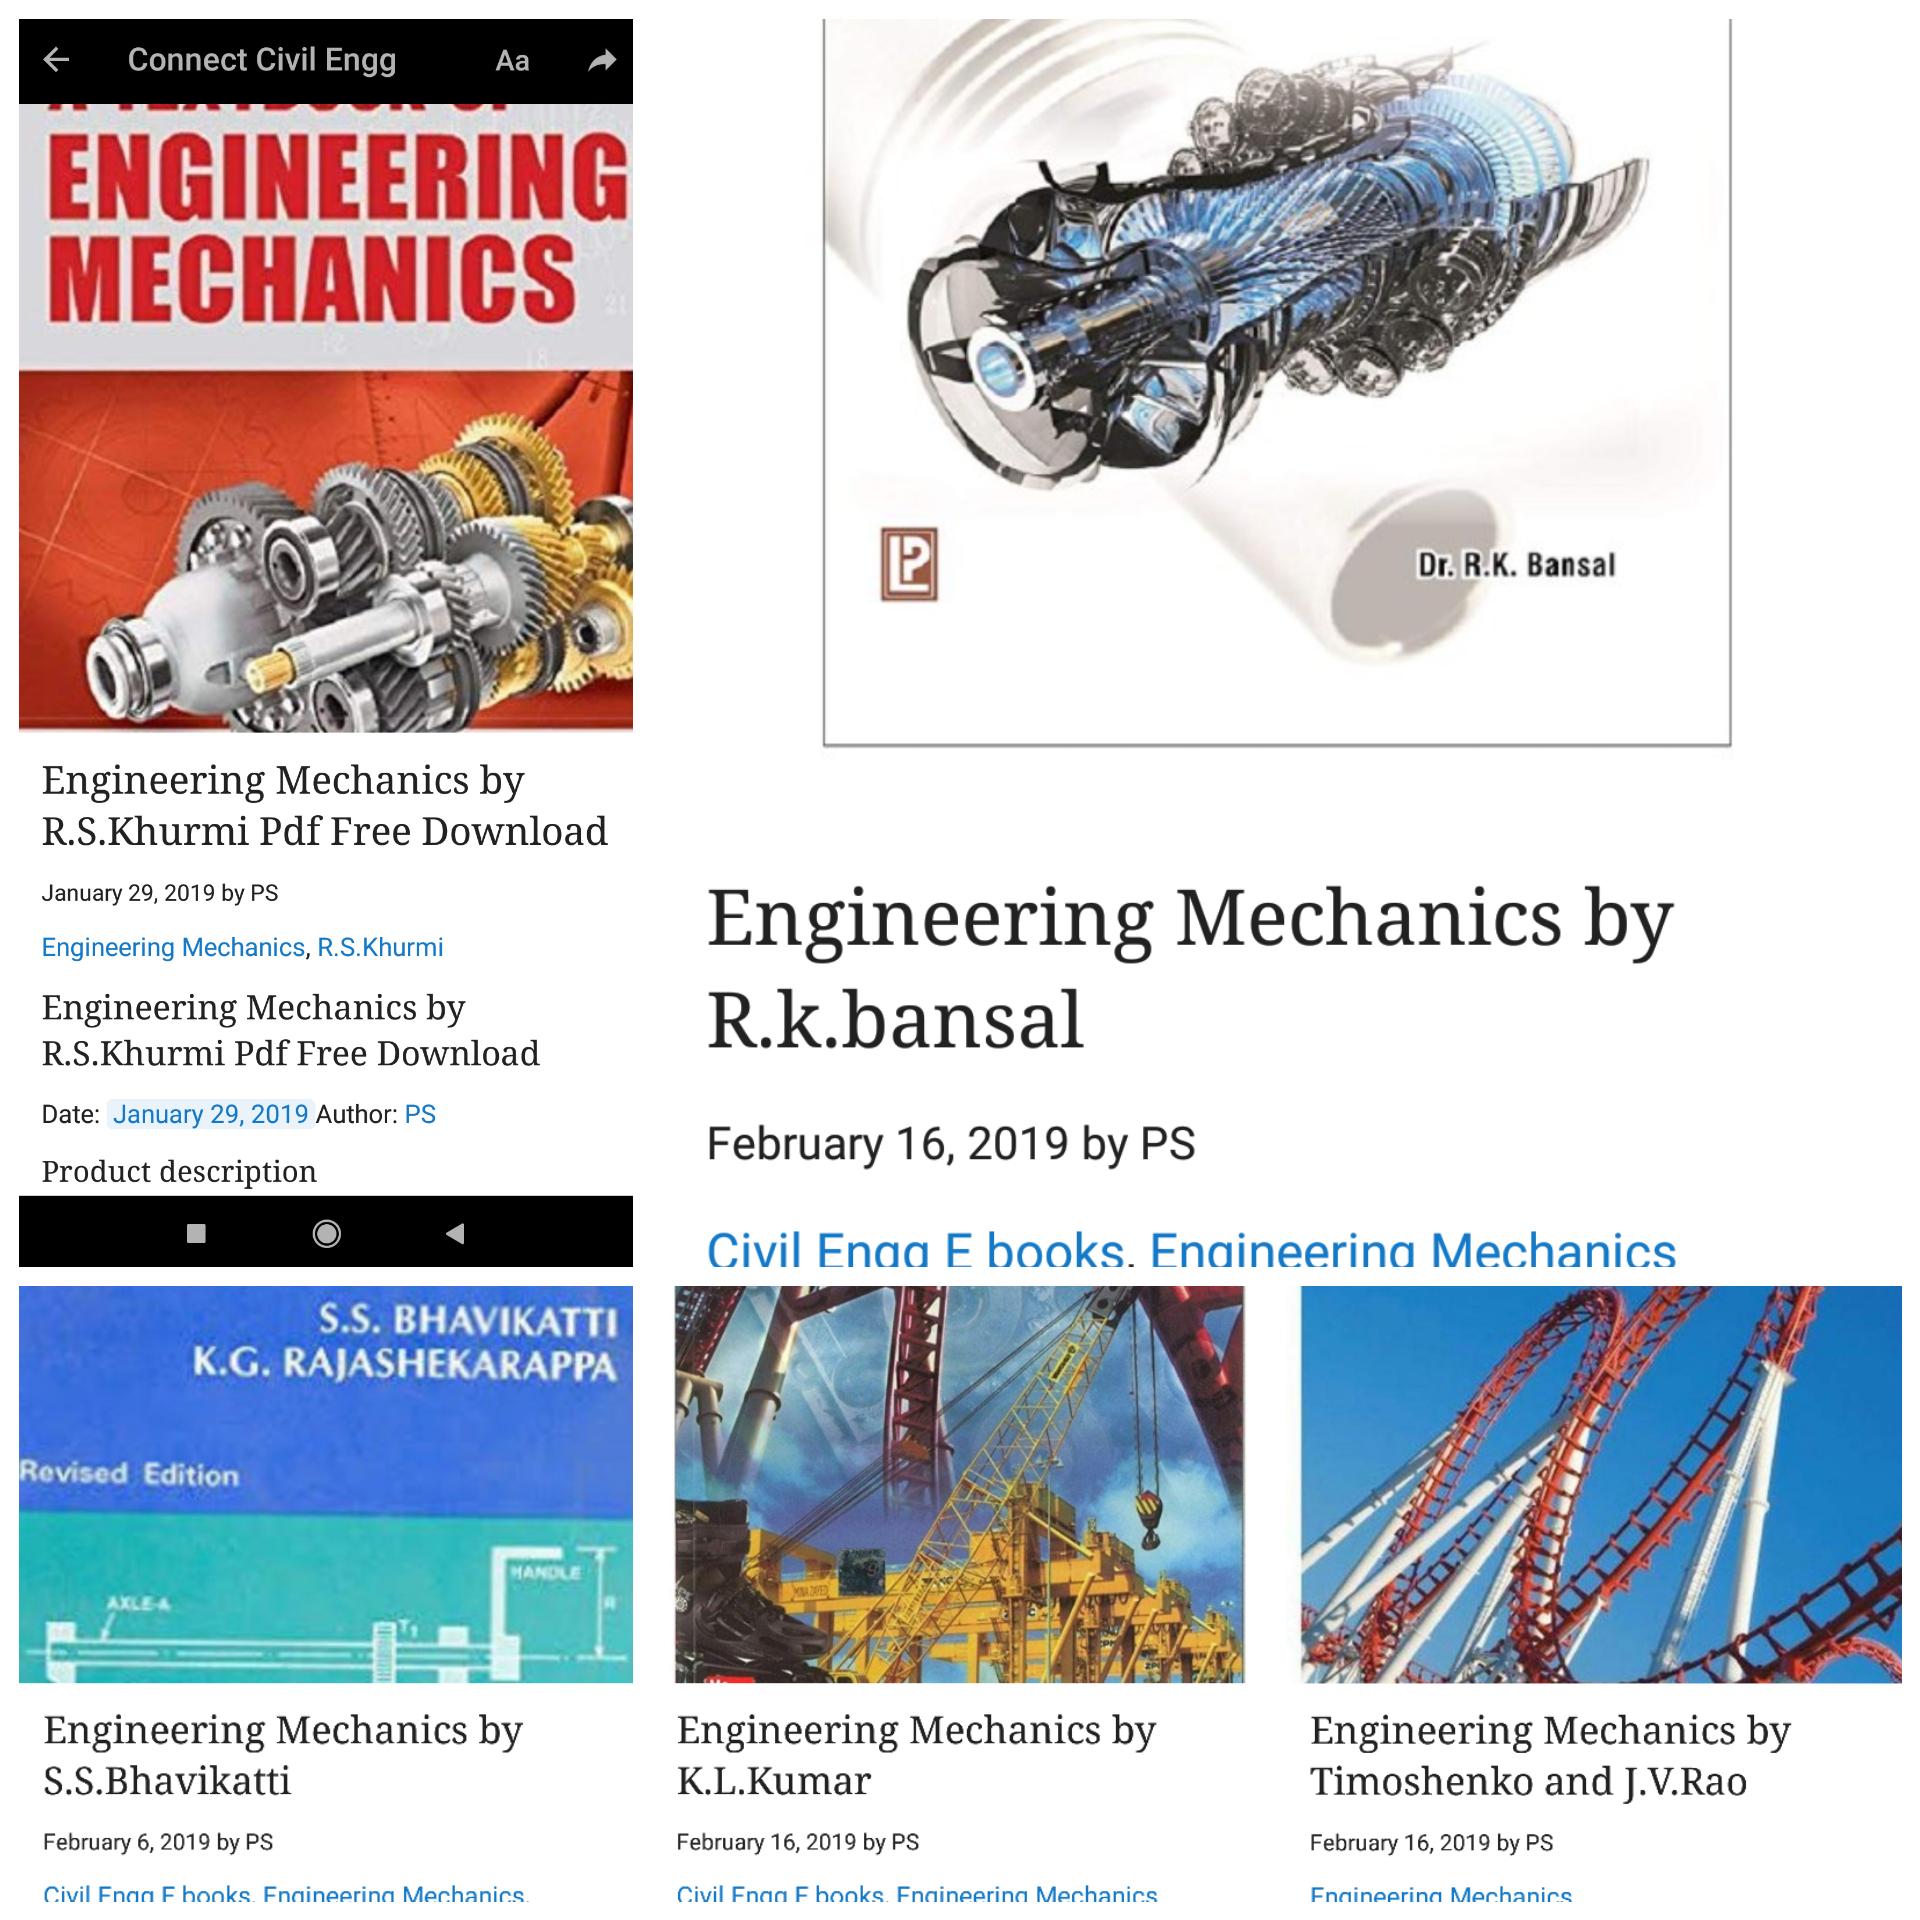 Timoshenko Engineering Mechanics Pdf